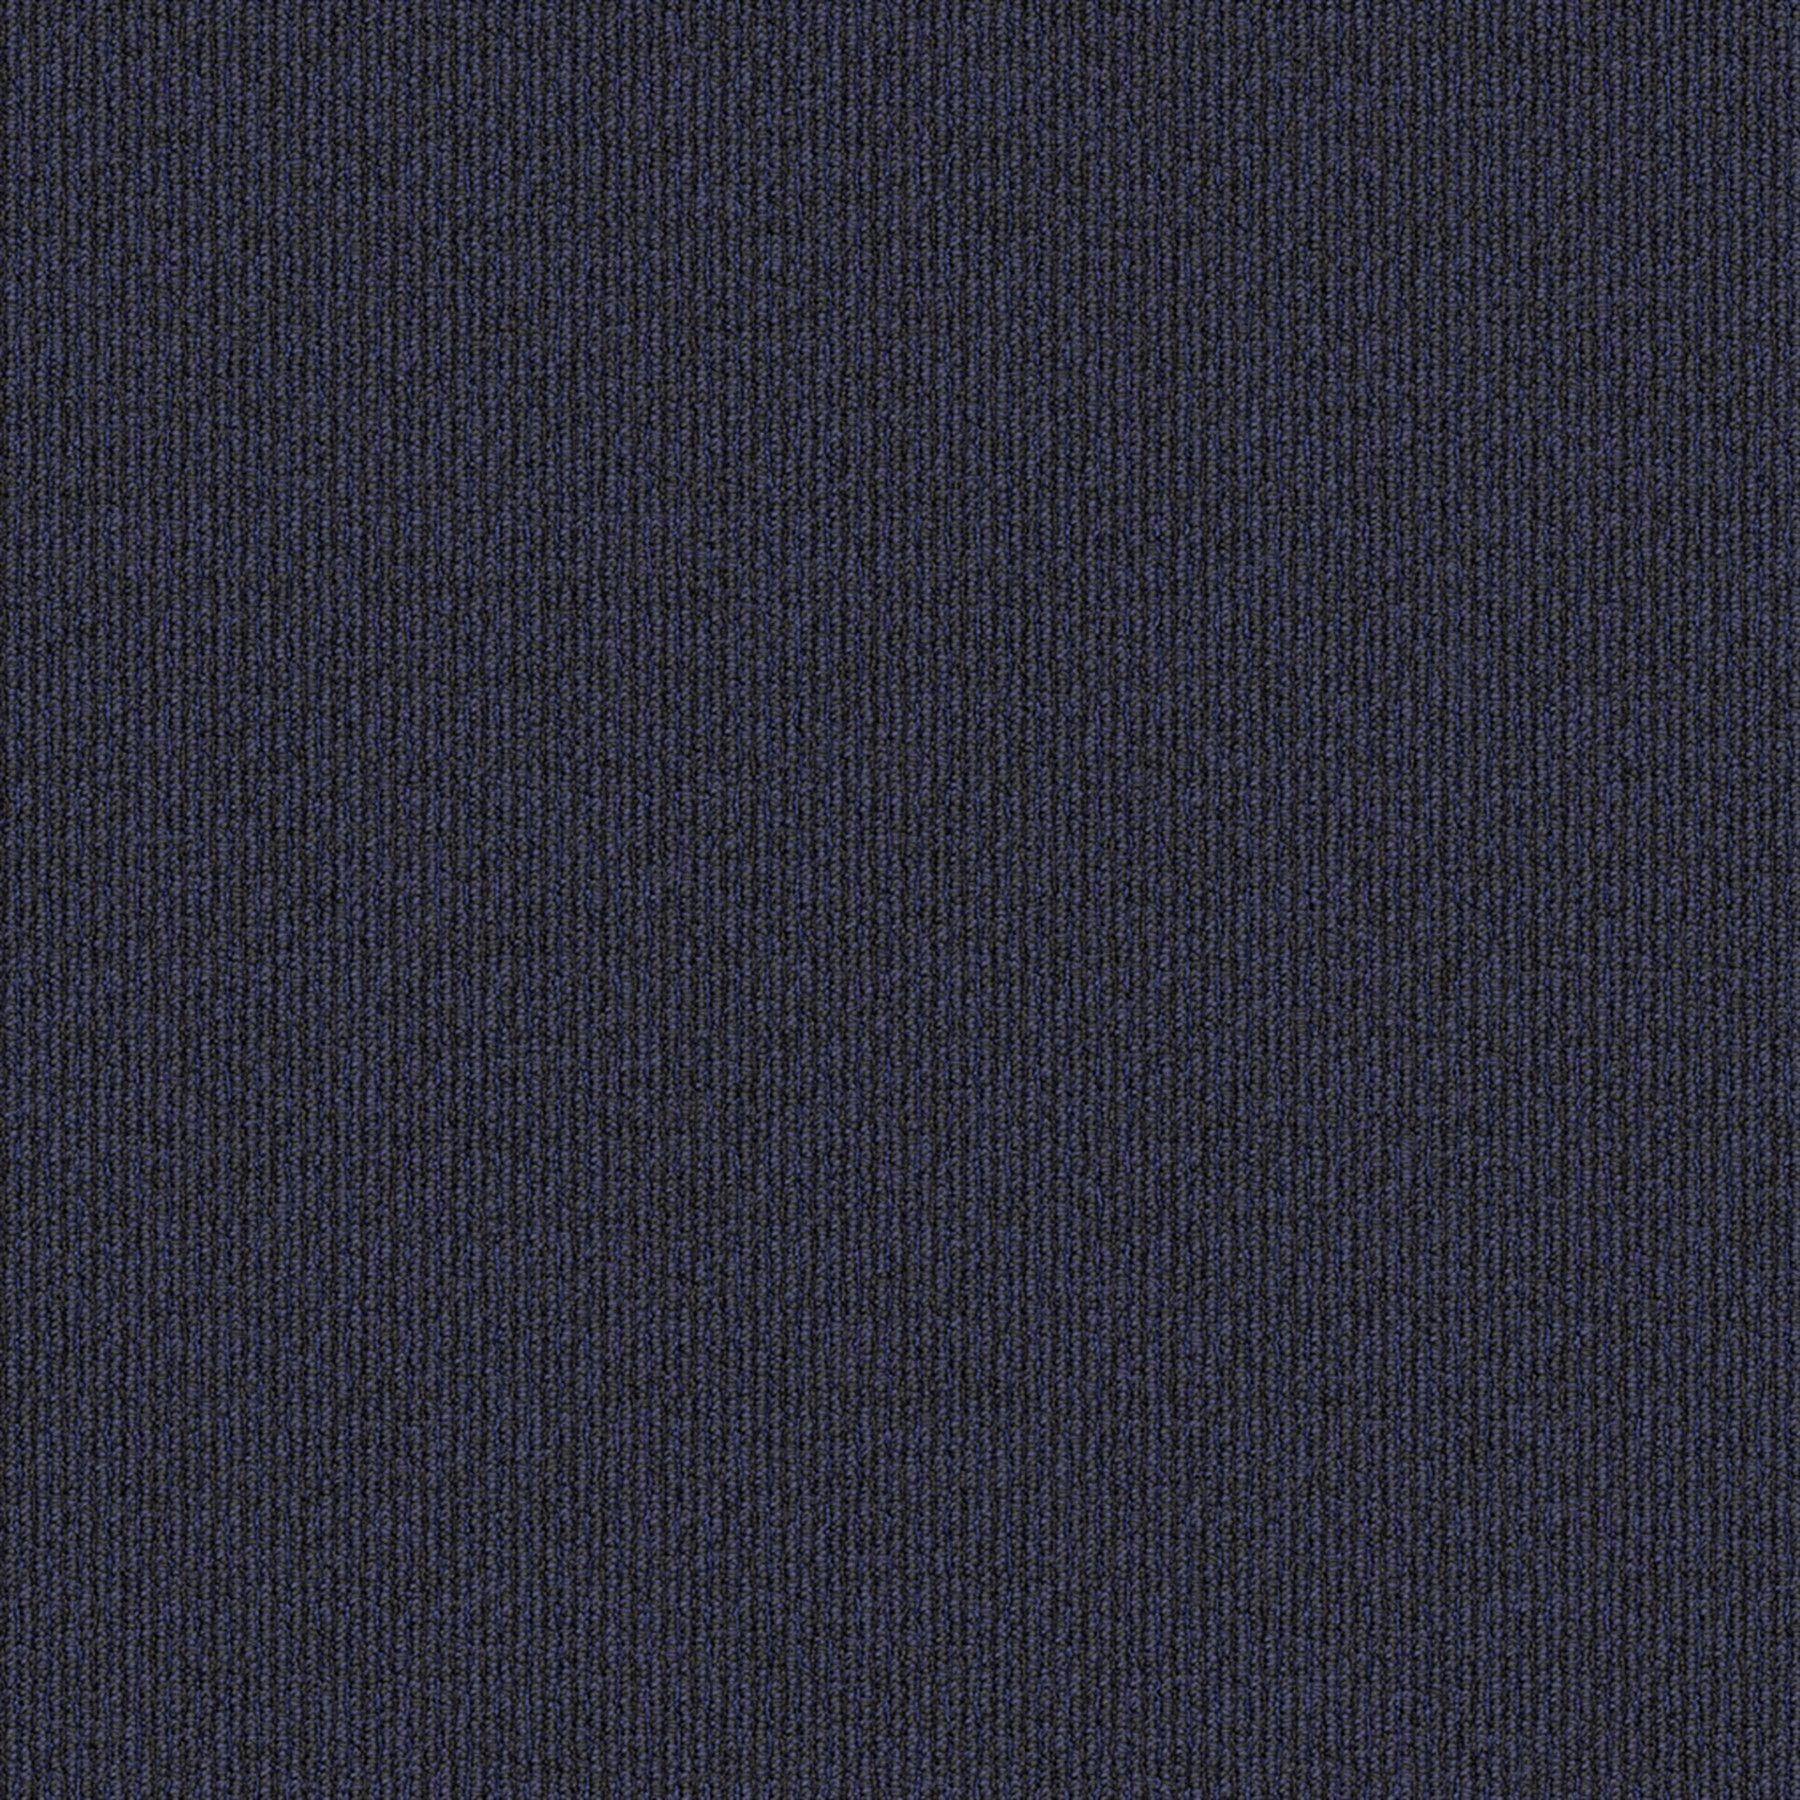 Jazzfest Bolyu Contract Carpet Flooring Solutions